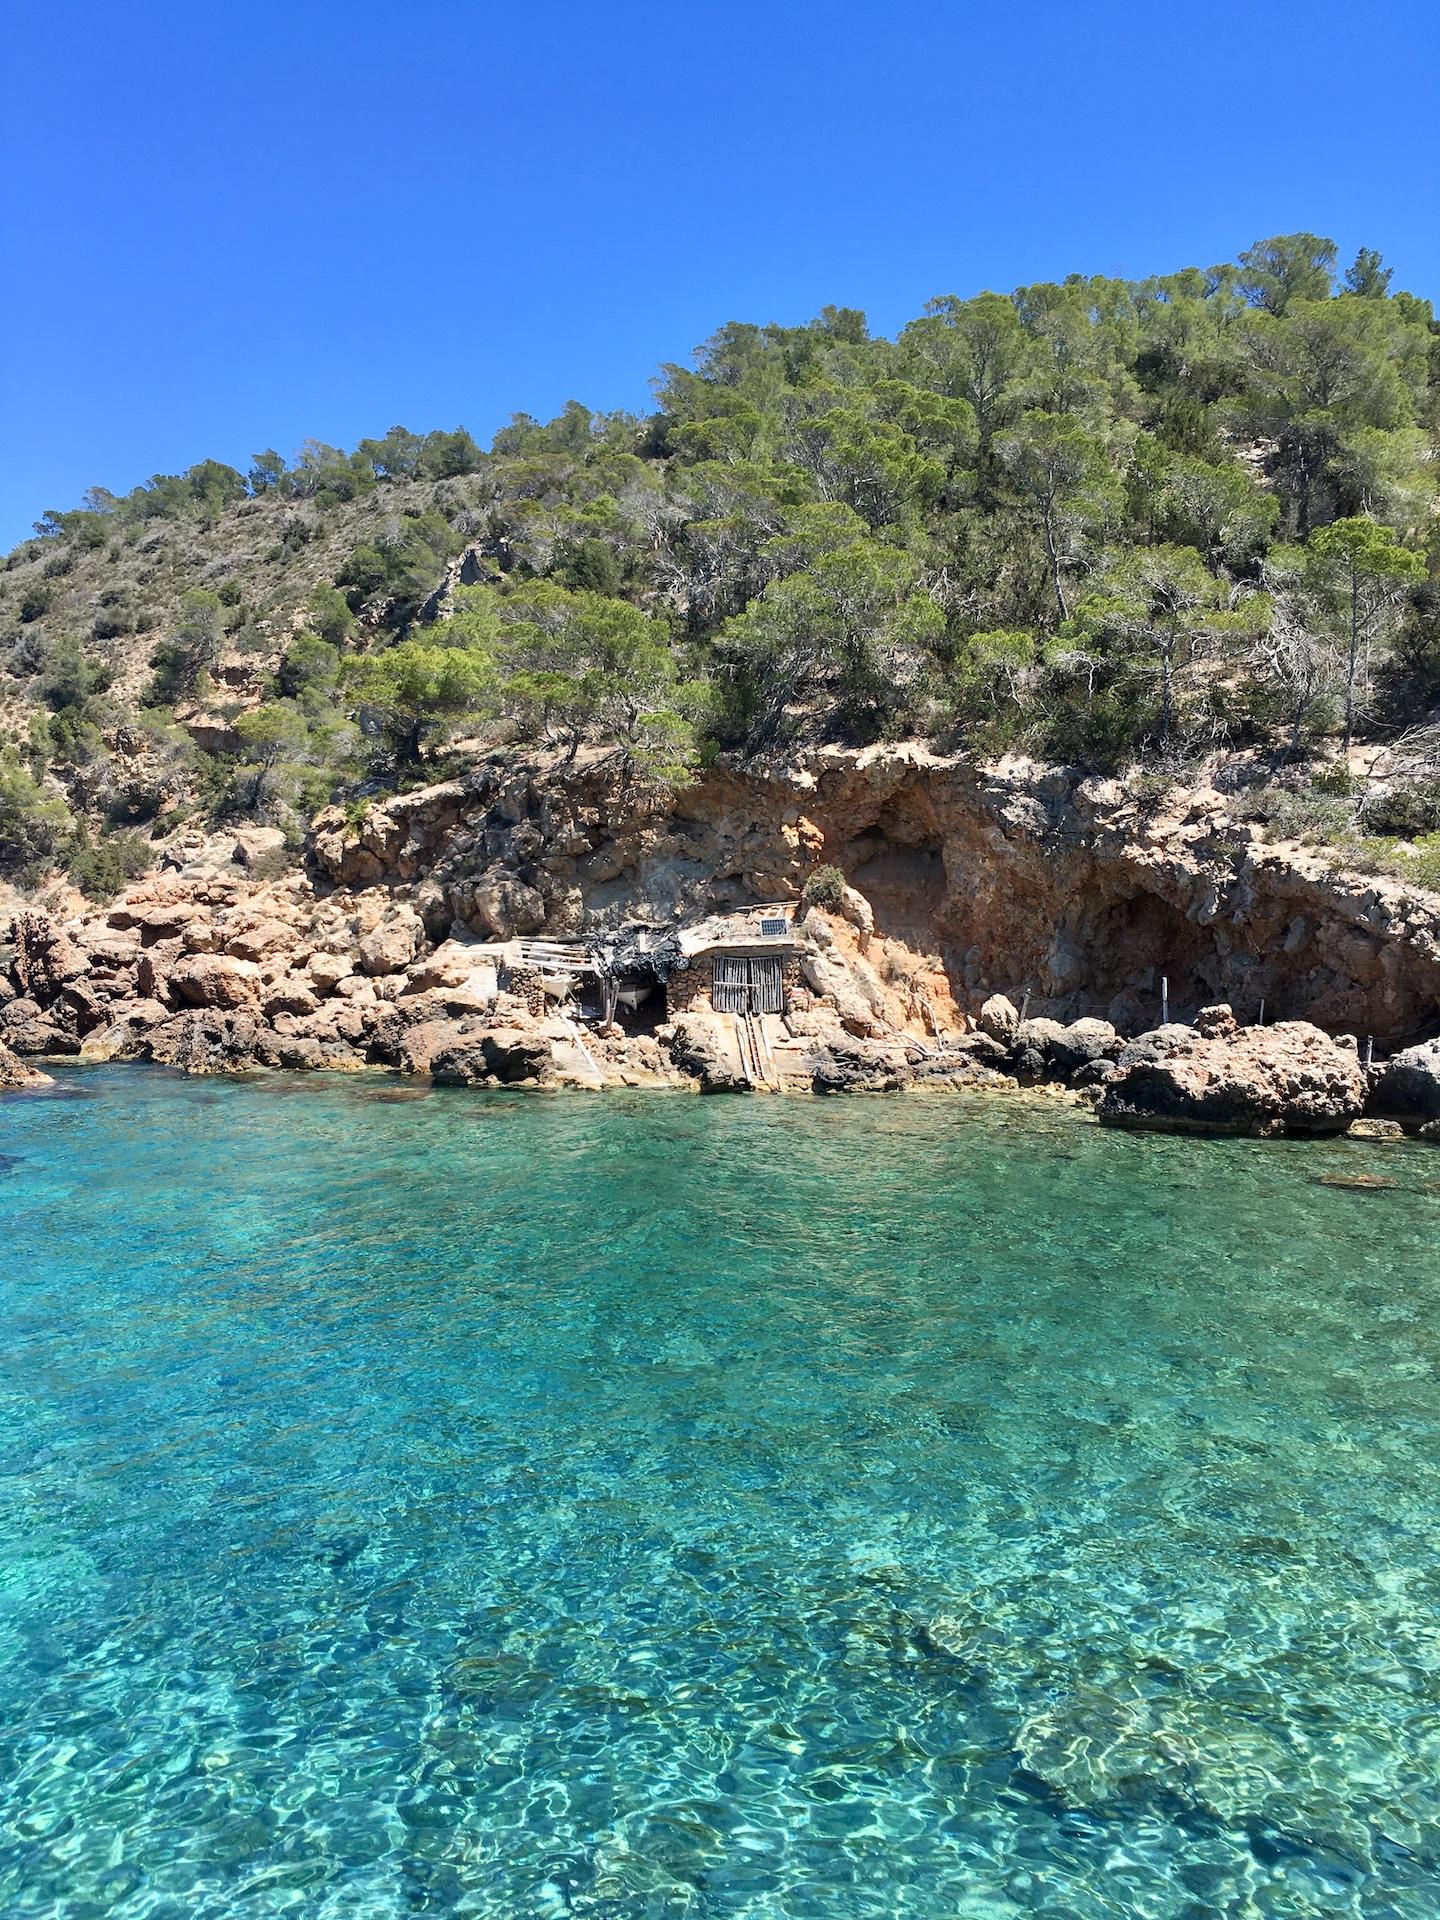 Cala Xuclar - wunderschöne Natur-Bucht in Ibizas Norden #Ibiza #Urlaub #Strand #Geheimtipp #Schnorcheln #Kajak #SUP